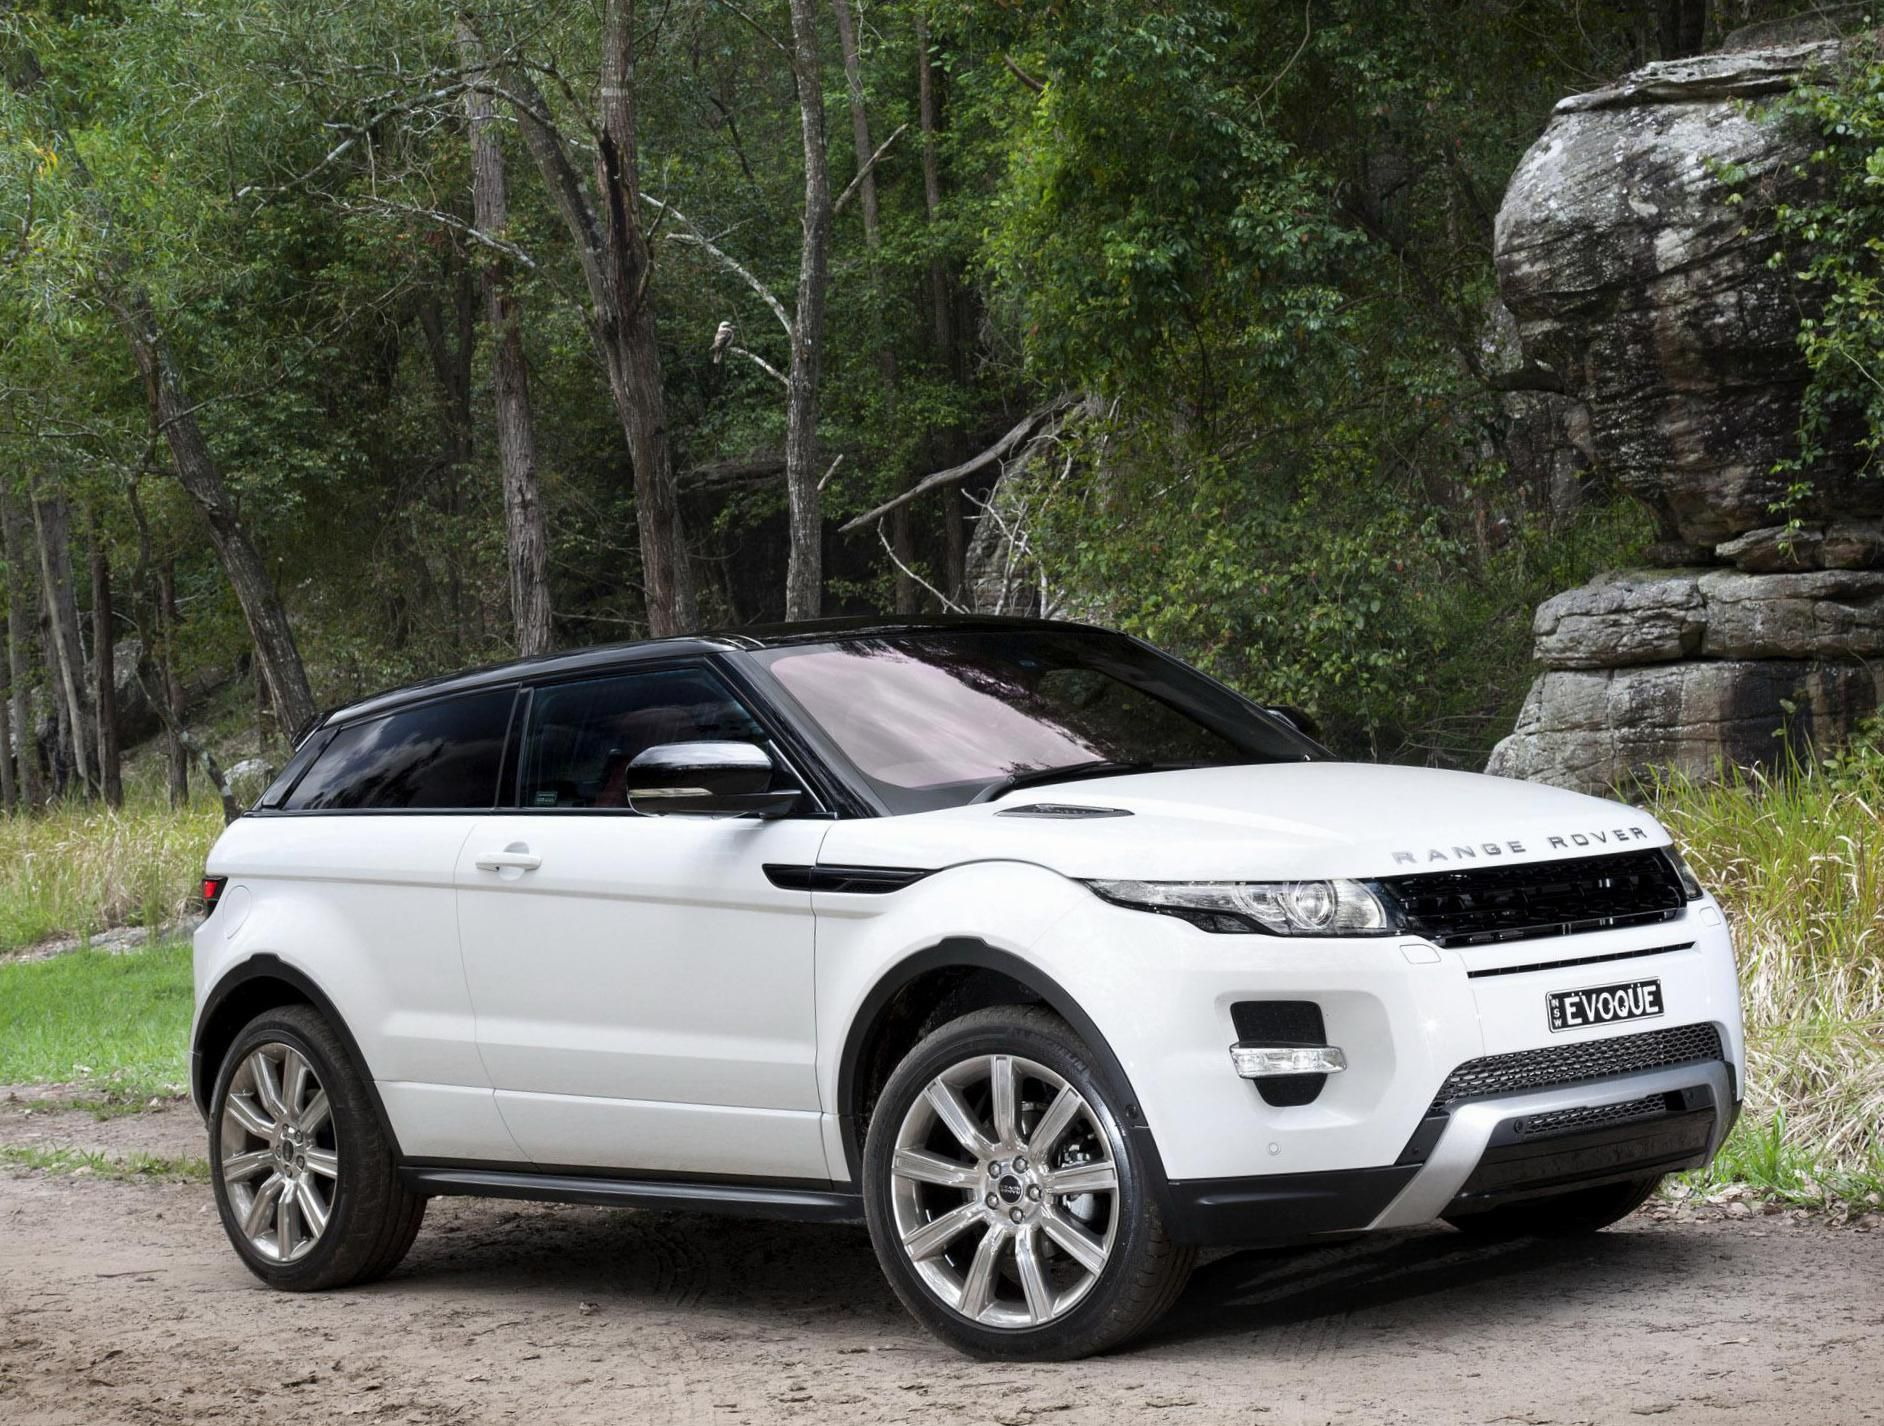 Range Rover Evoque Coupe Land Rover review http